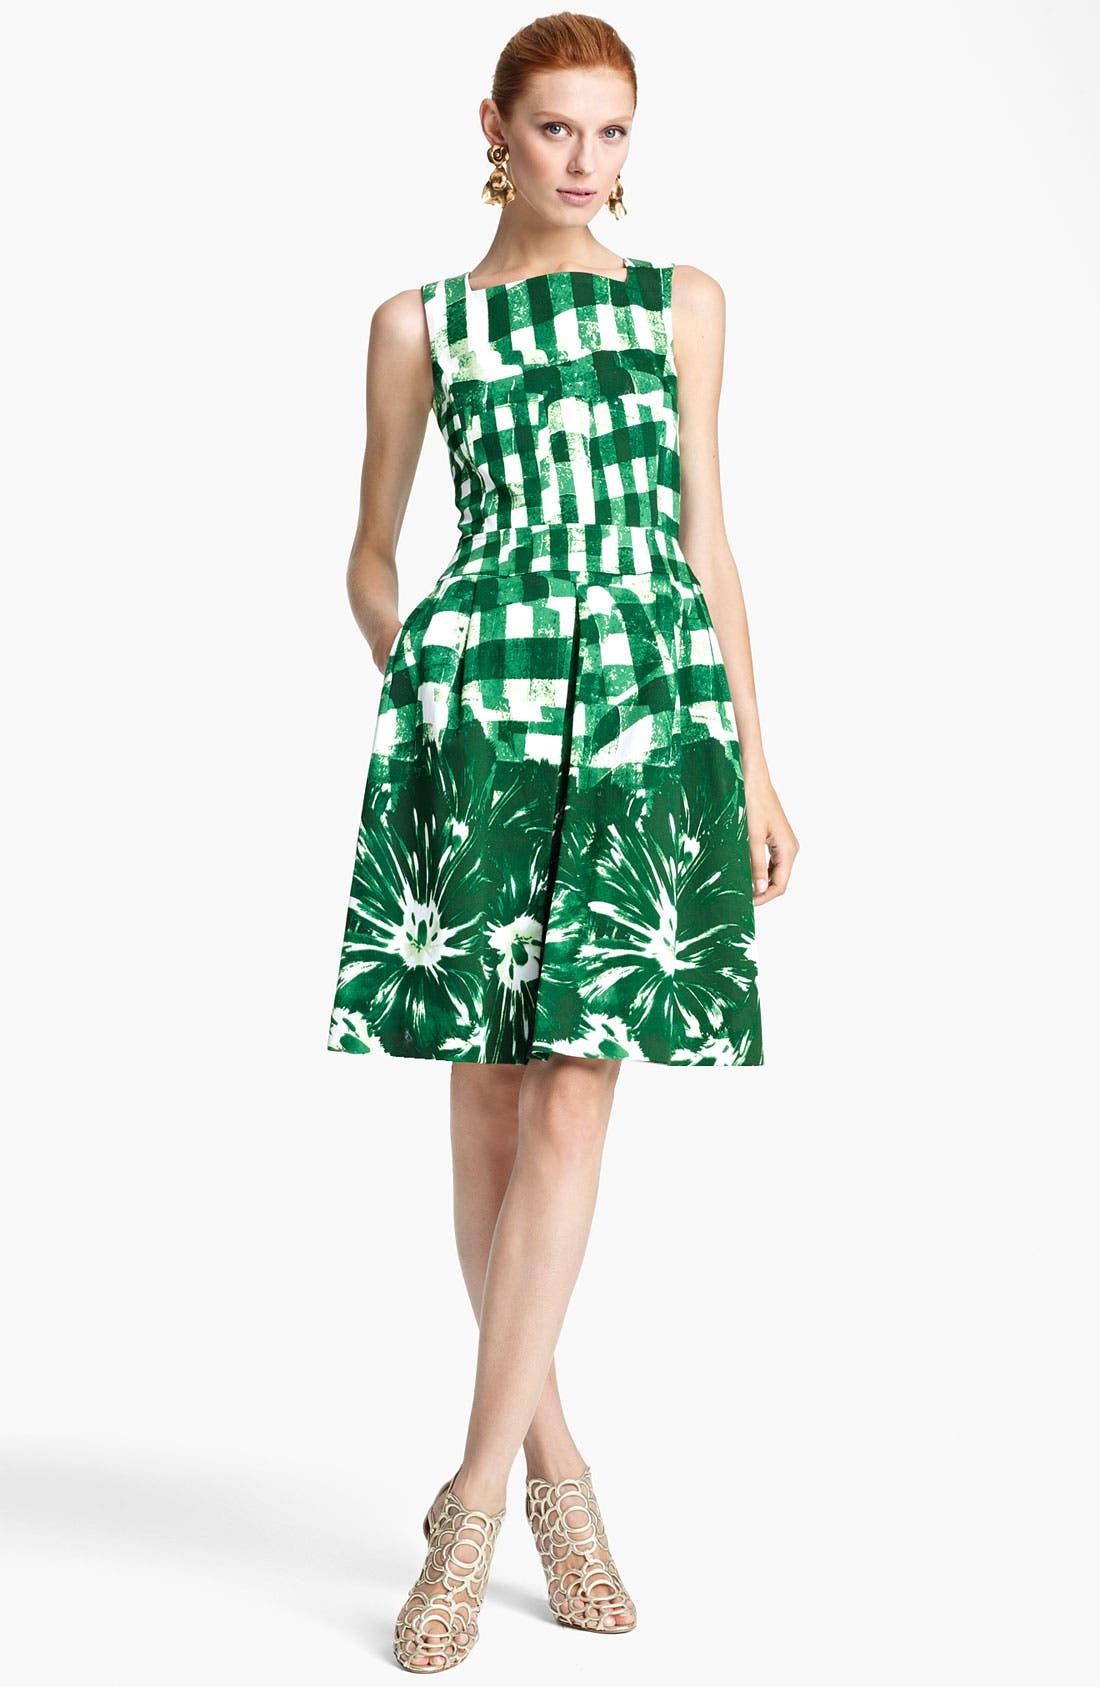 Alternate Image 1 Selected - Oscar de la Renta Print Piqué Dress